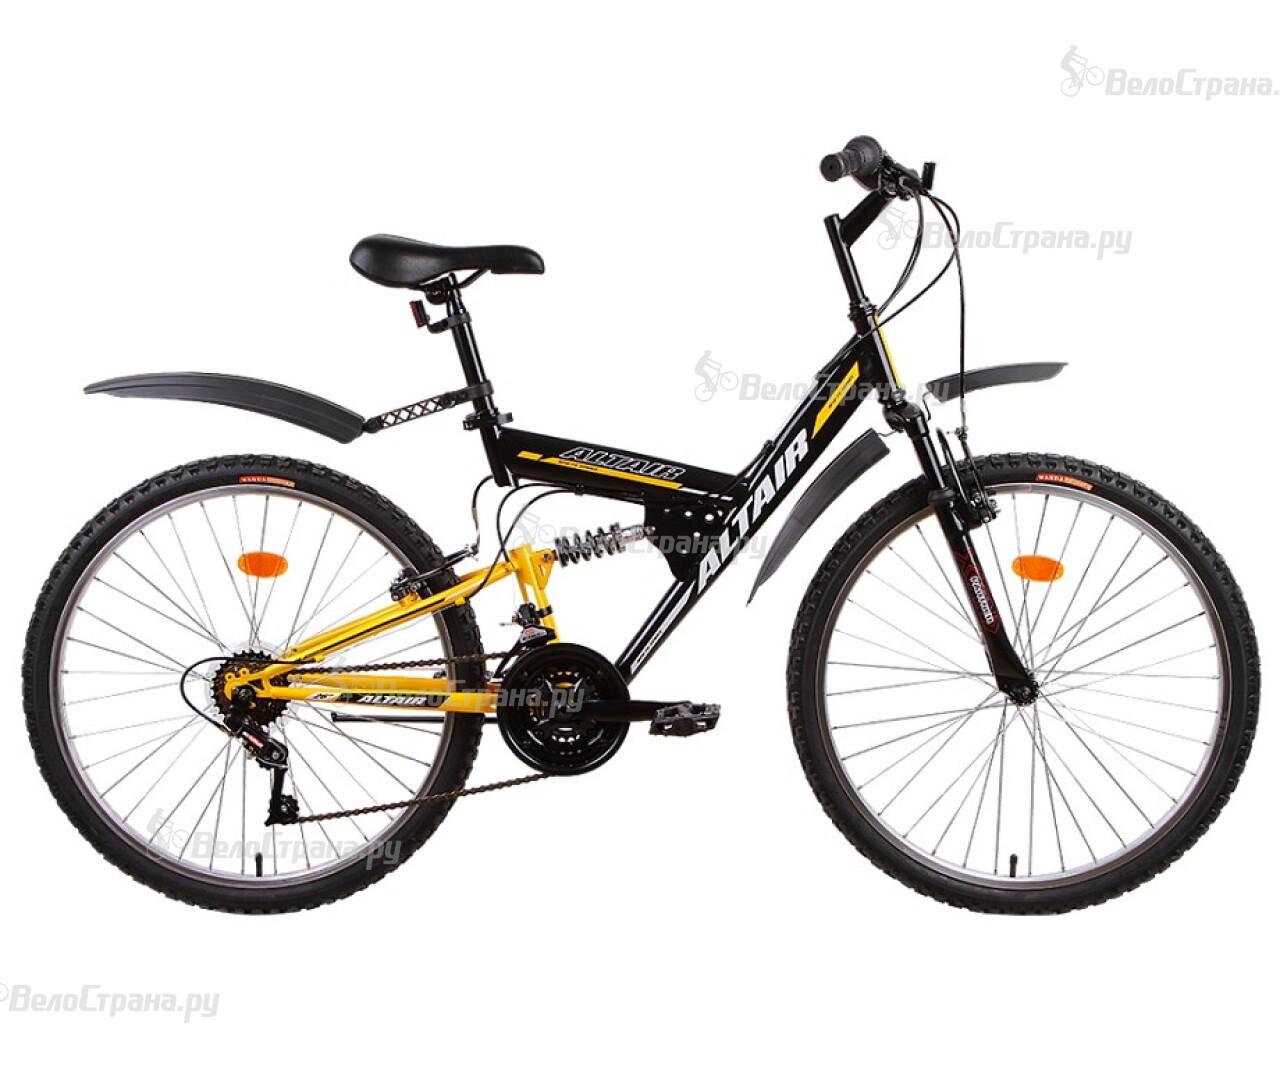 Велосипед Forward Altair MTB FS 26 (2015) велосипед altair city high 28 19 2015 dark blue